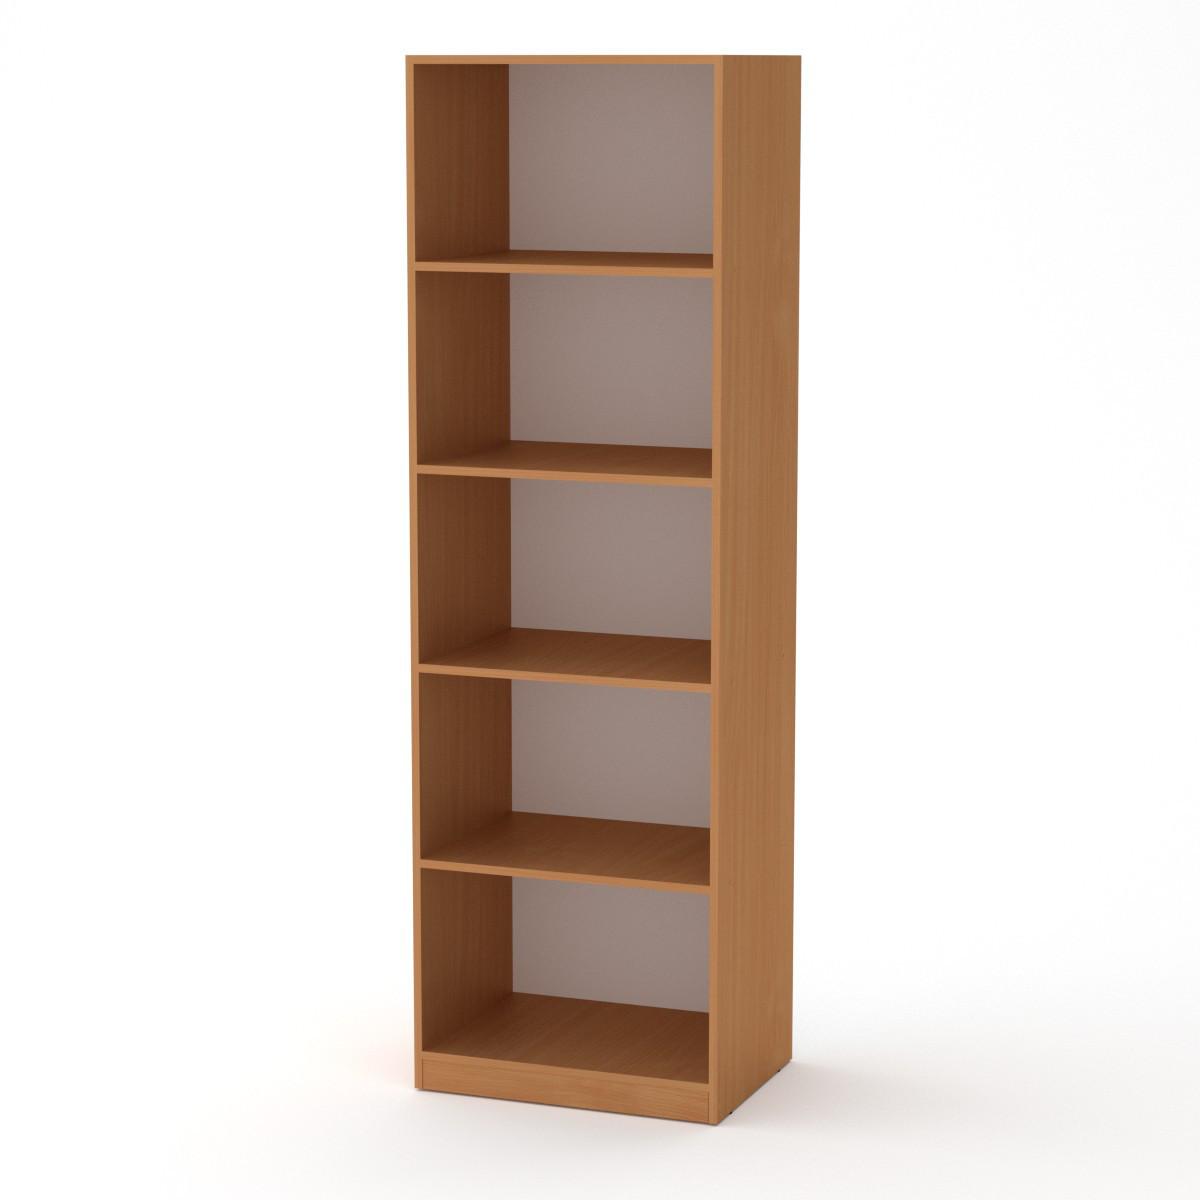 Шкаф книжный КШ-1 бук Компанит (61х45х195 см)